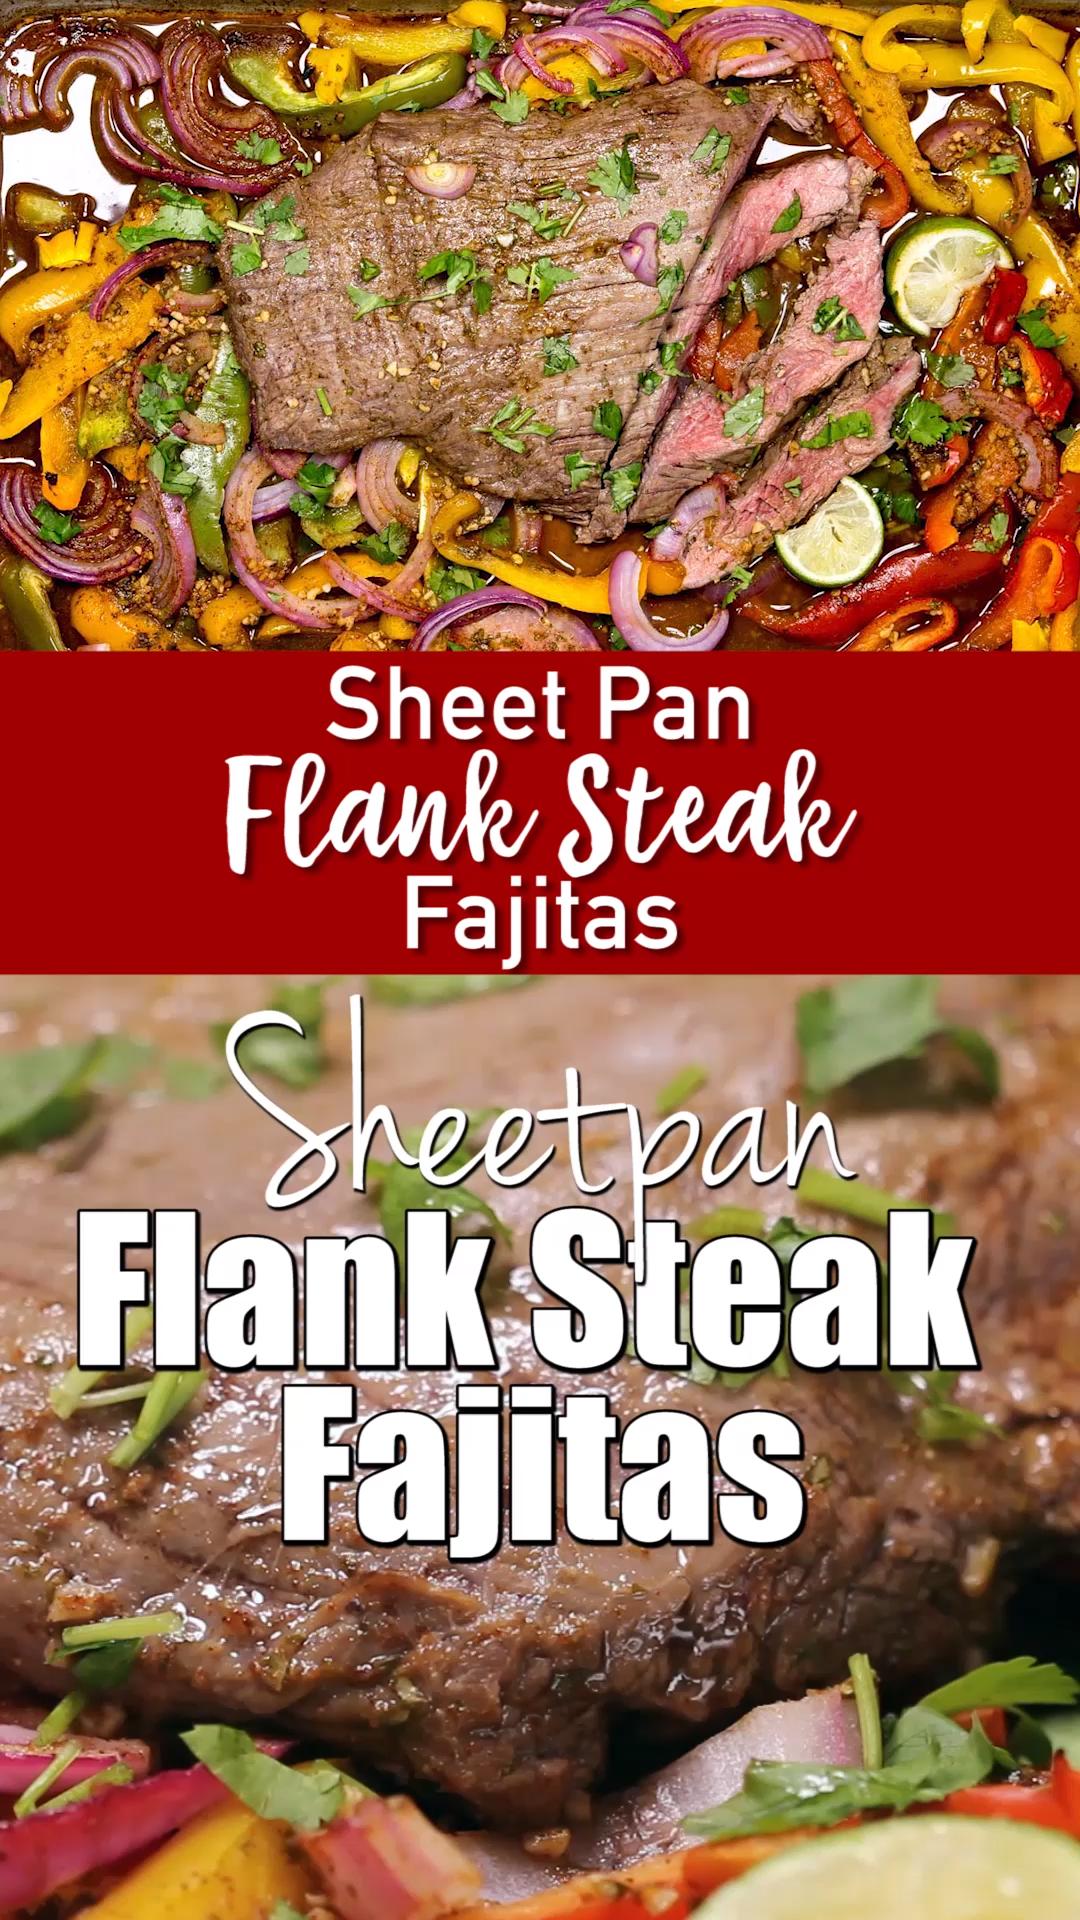 Sheet Pan Flank Steak Fajitas